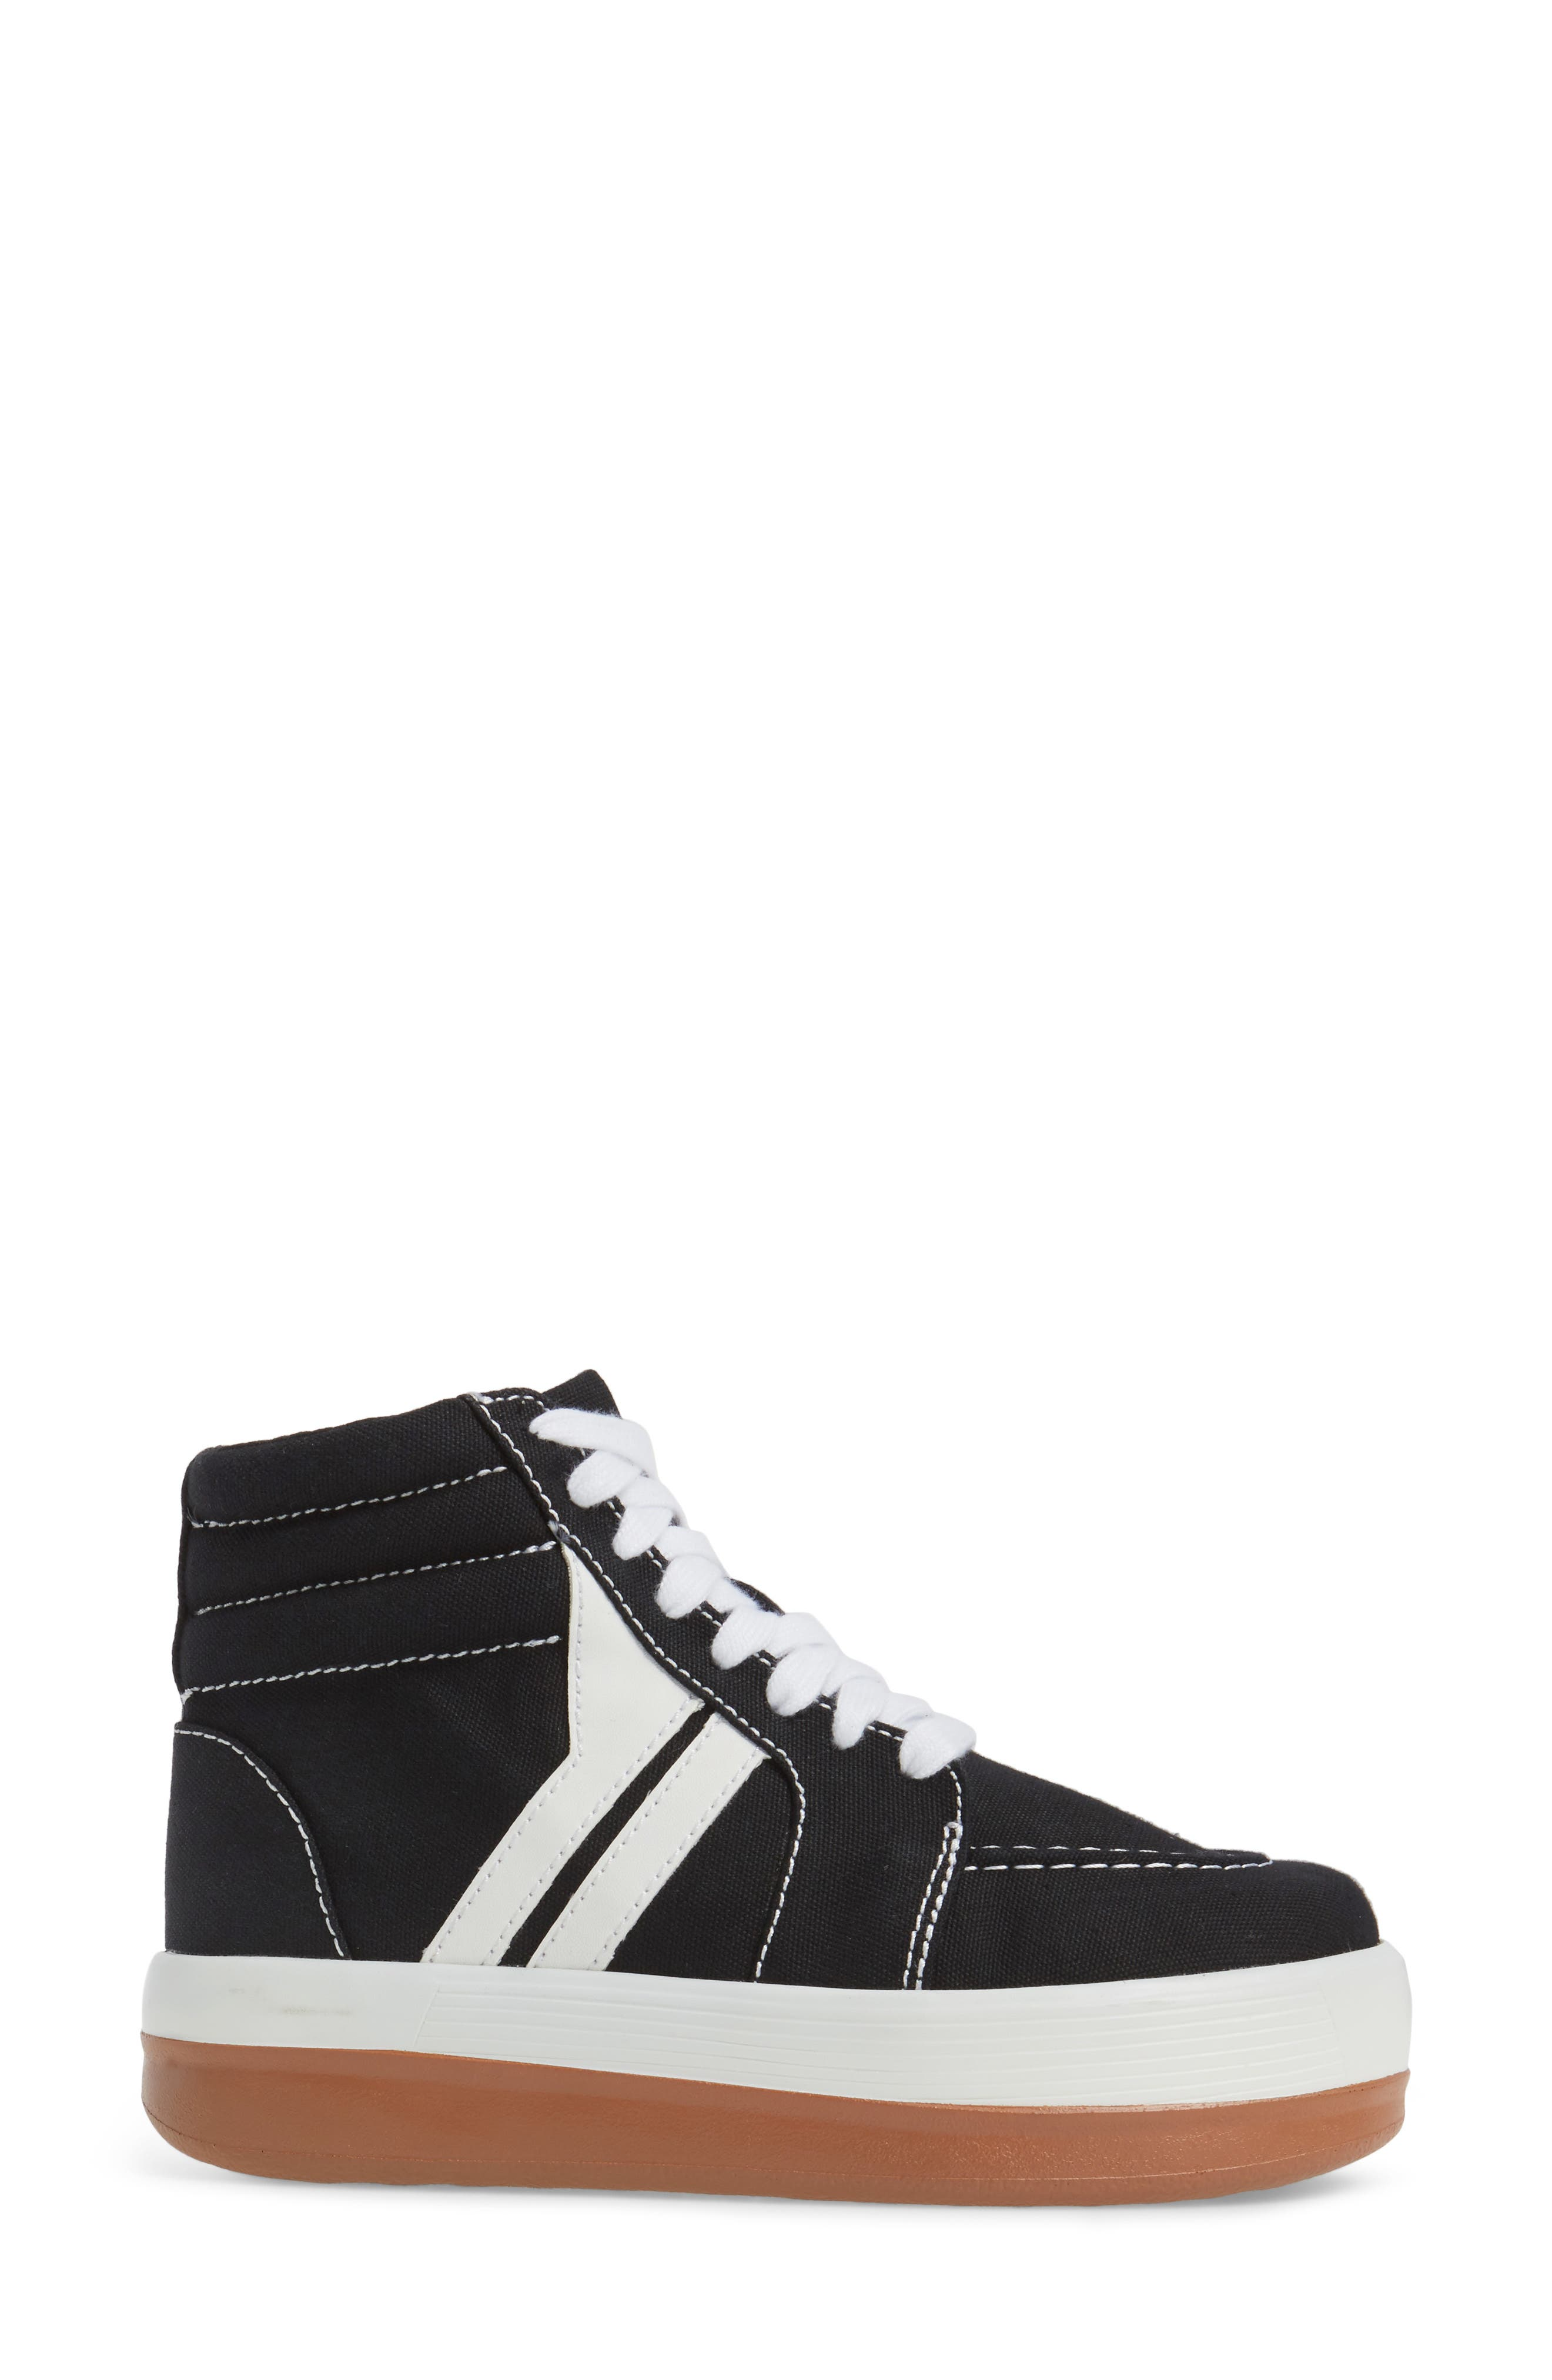 Alternate Image 3  - Jeffrey Campbell Grind High Top Sneaker (Women)